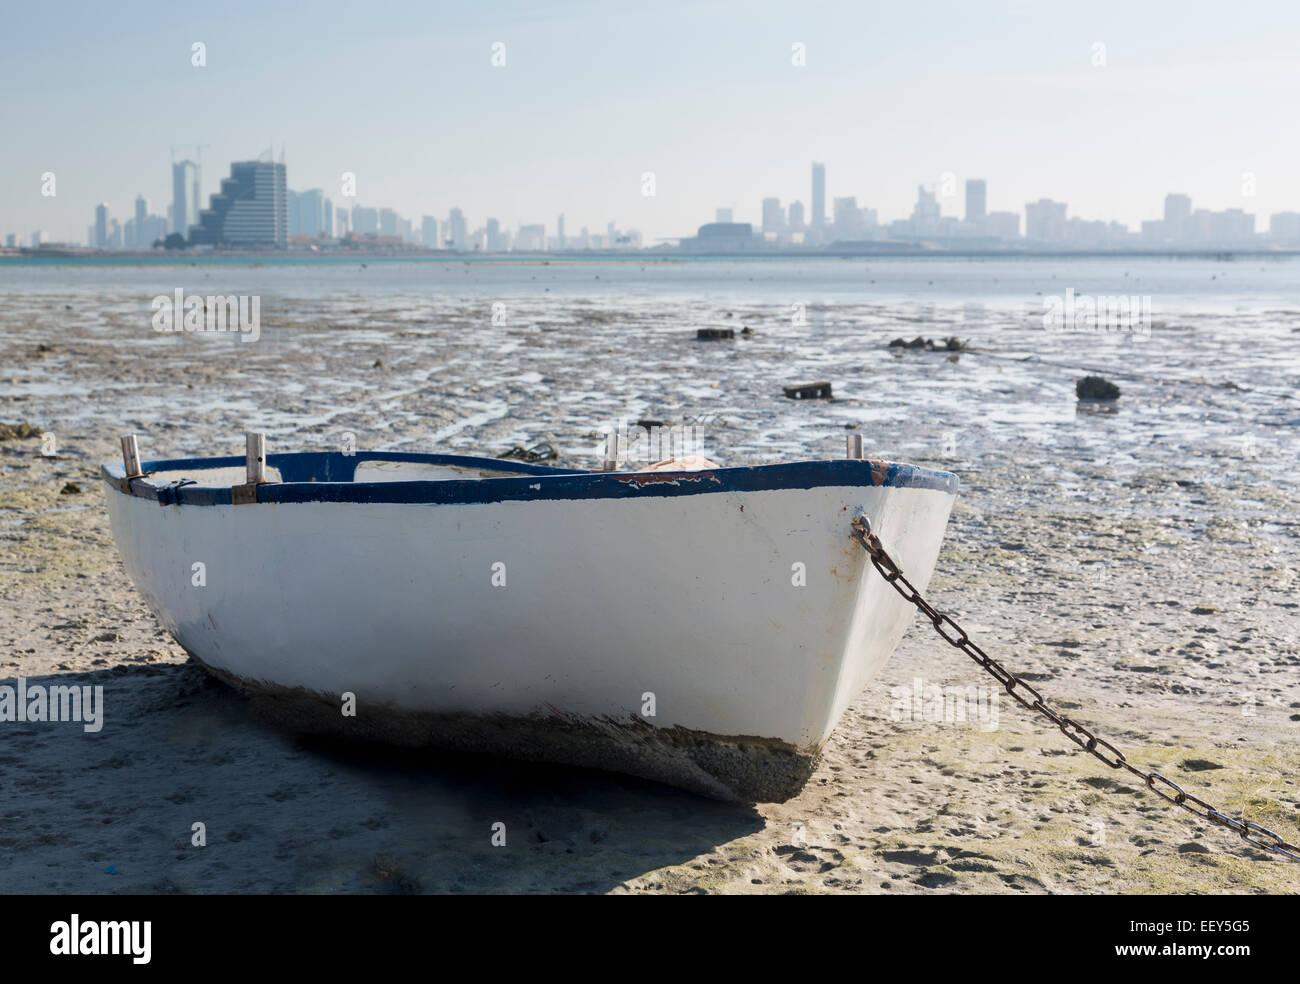 Fishing boat on waterside overlooking Manama, Bahrain, Middle East - Stock Image